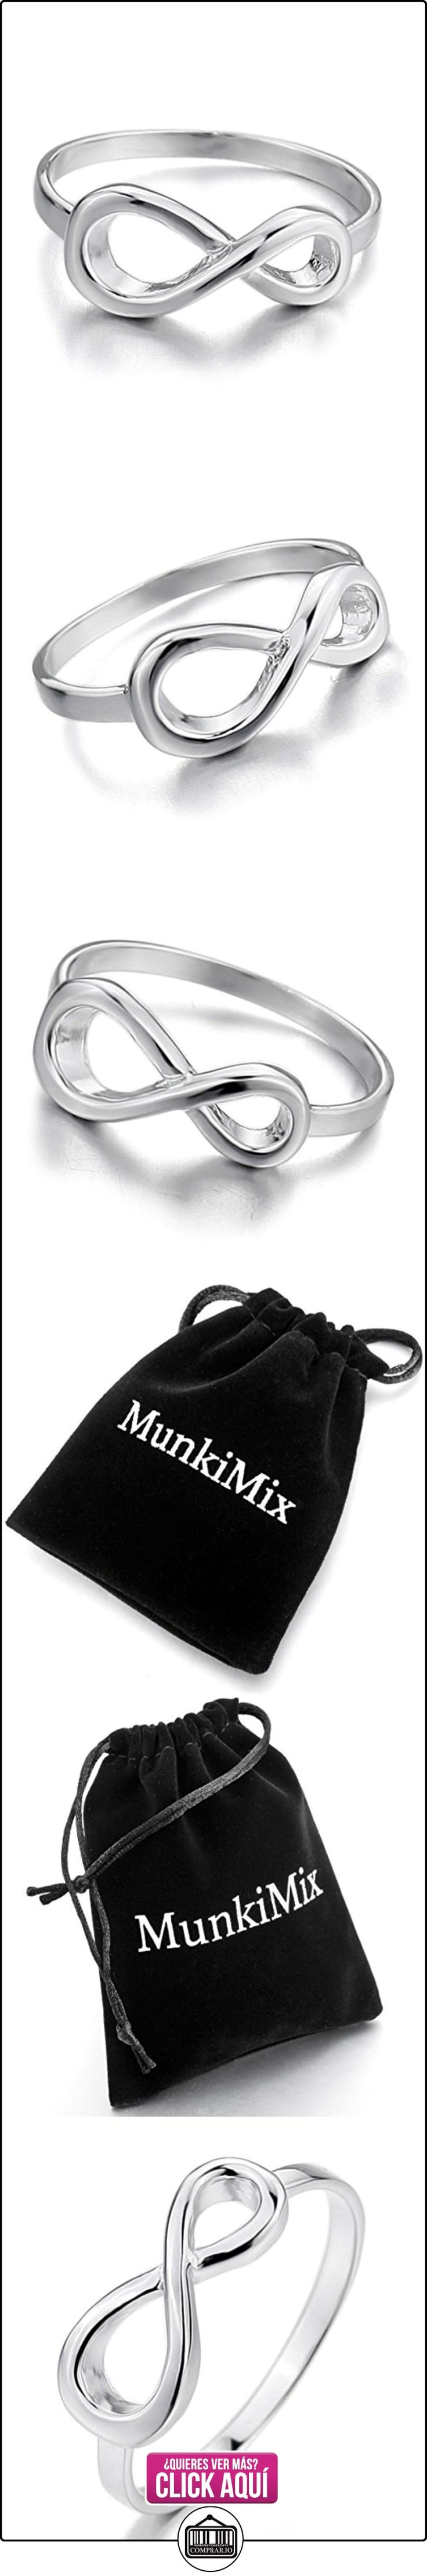 MunkiMix 925 Plata Anillo Ring Plata Infinito Infinity Amor Love Símbolo 8 Para Siempre Forever Alianzas Boda Talla Tamaño 20 Mujer  ✿ Joyas para mujer - Las mejores ofertas ✿ ▬► Ver oferta: https://comprar.io/goto/B00D6DU648